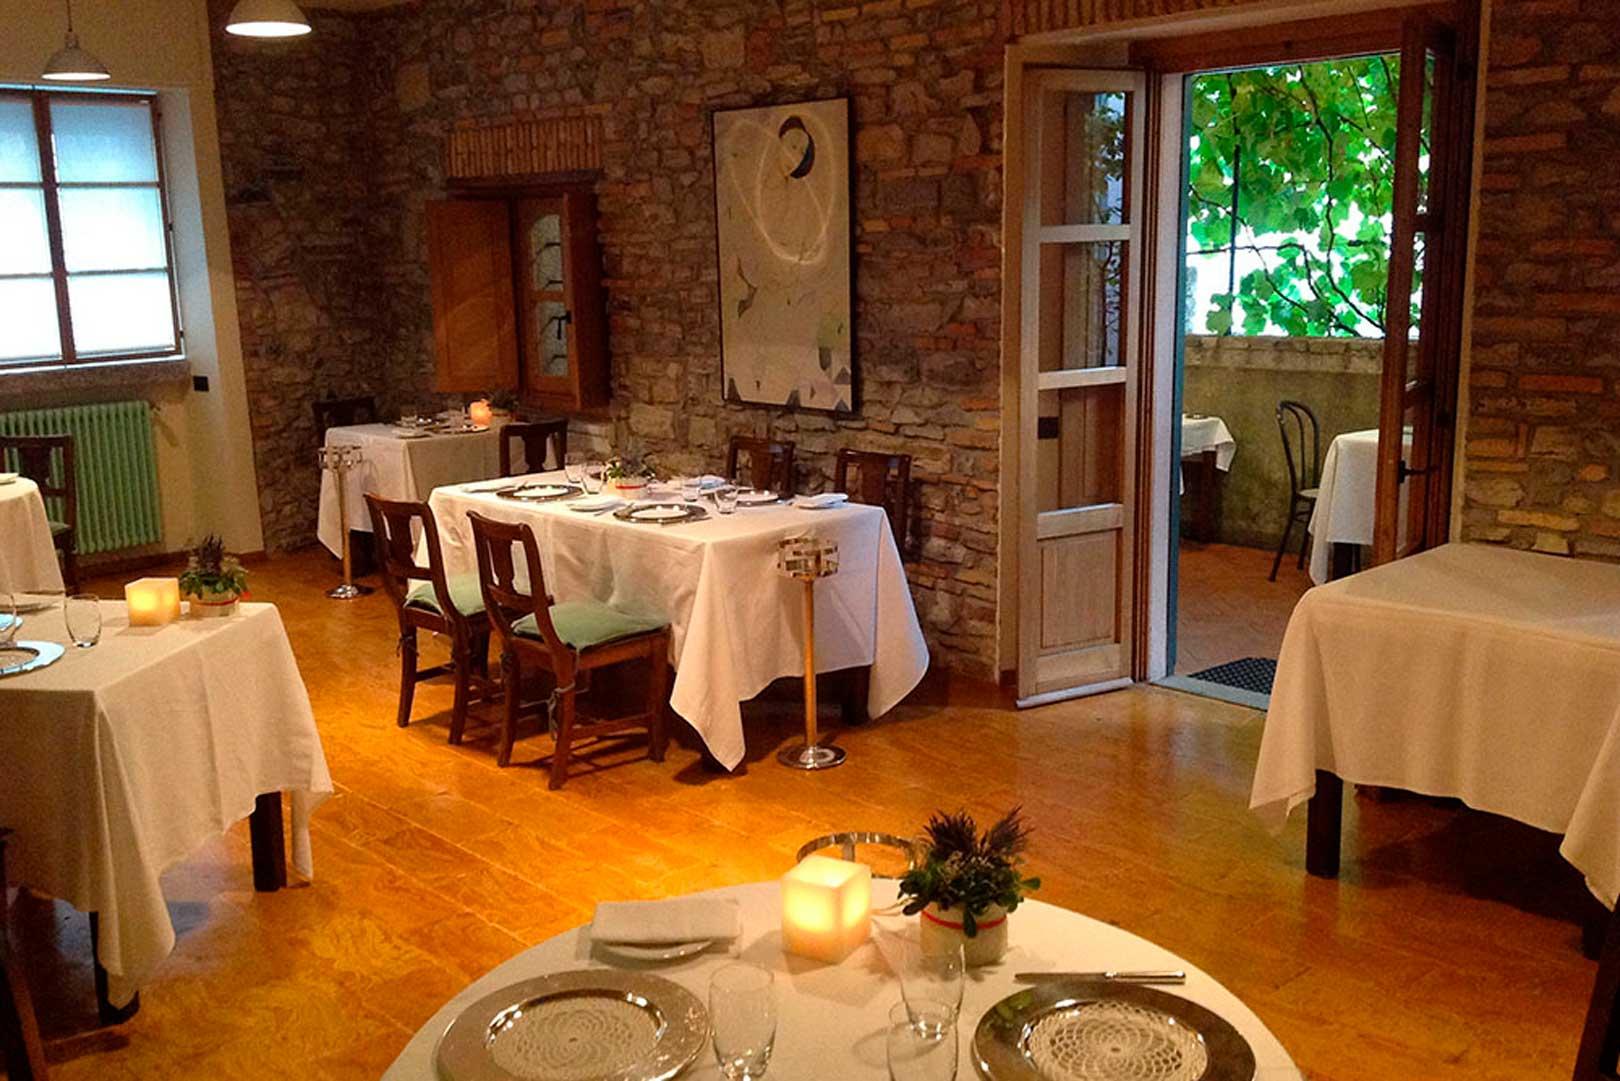 Emejing Ristorante Le Terrazze Di Montevecchia Photos - Modern Home ...